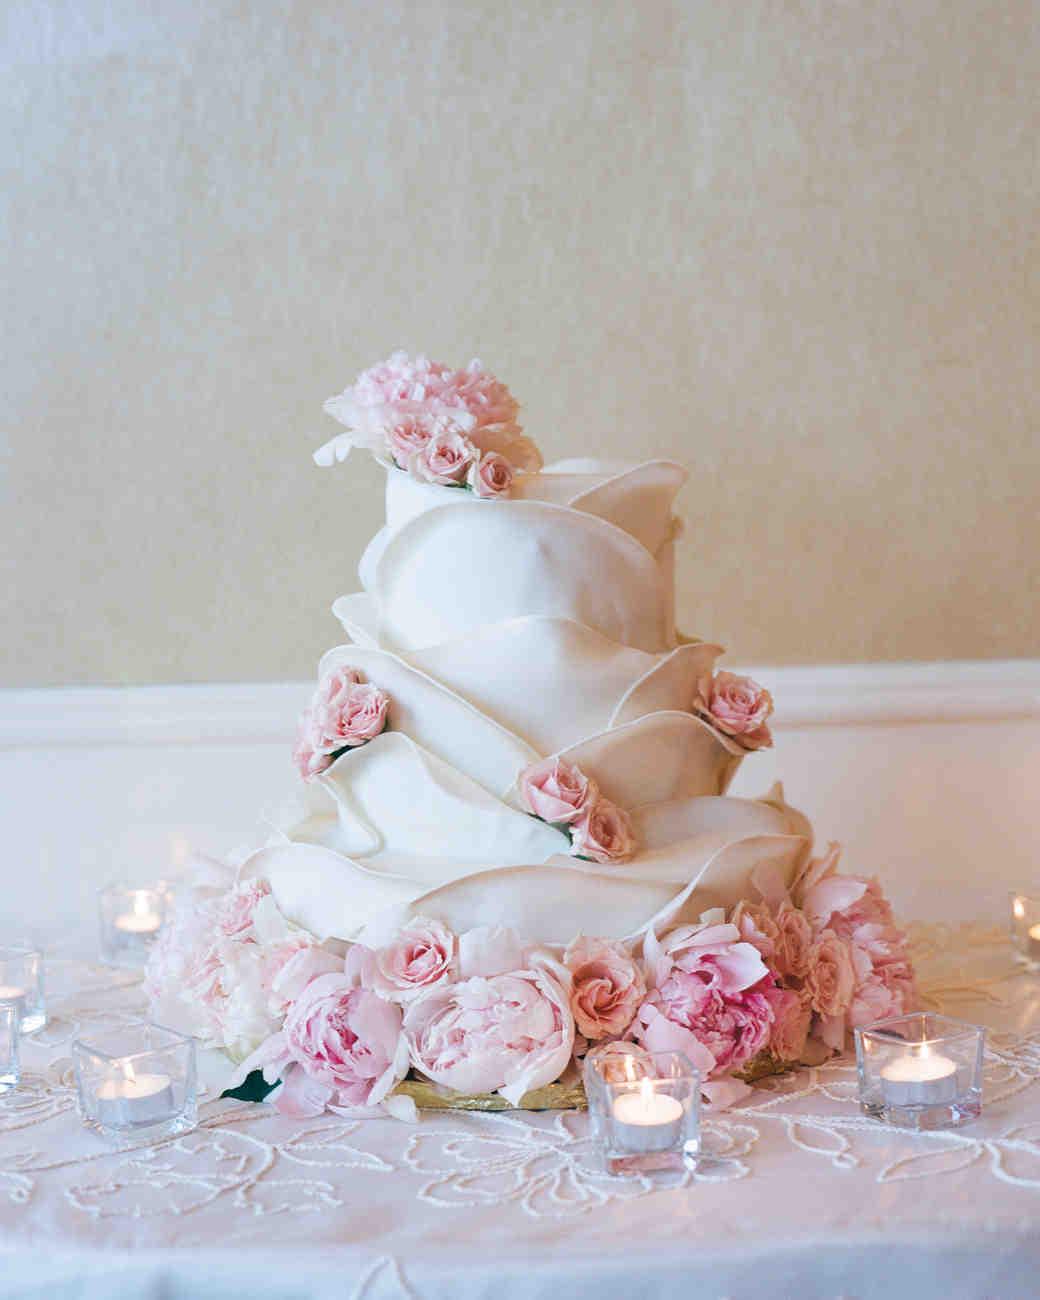 marwa-peter-wedding-cake-0414.jpg